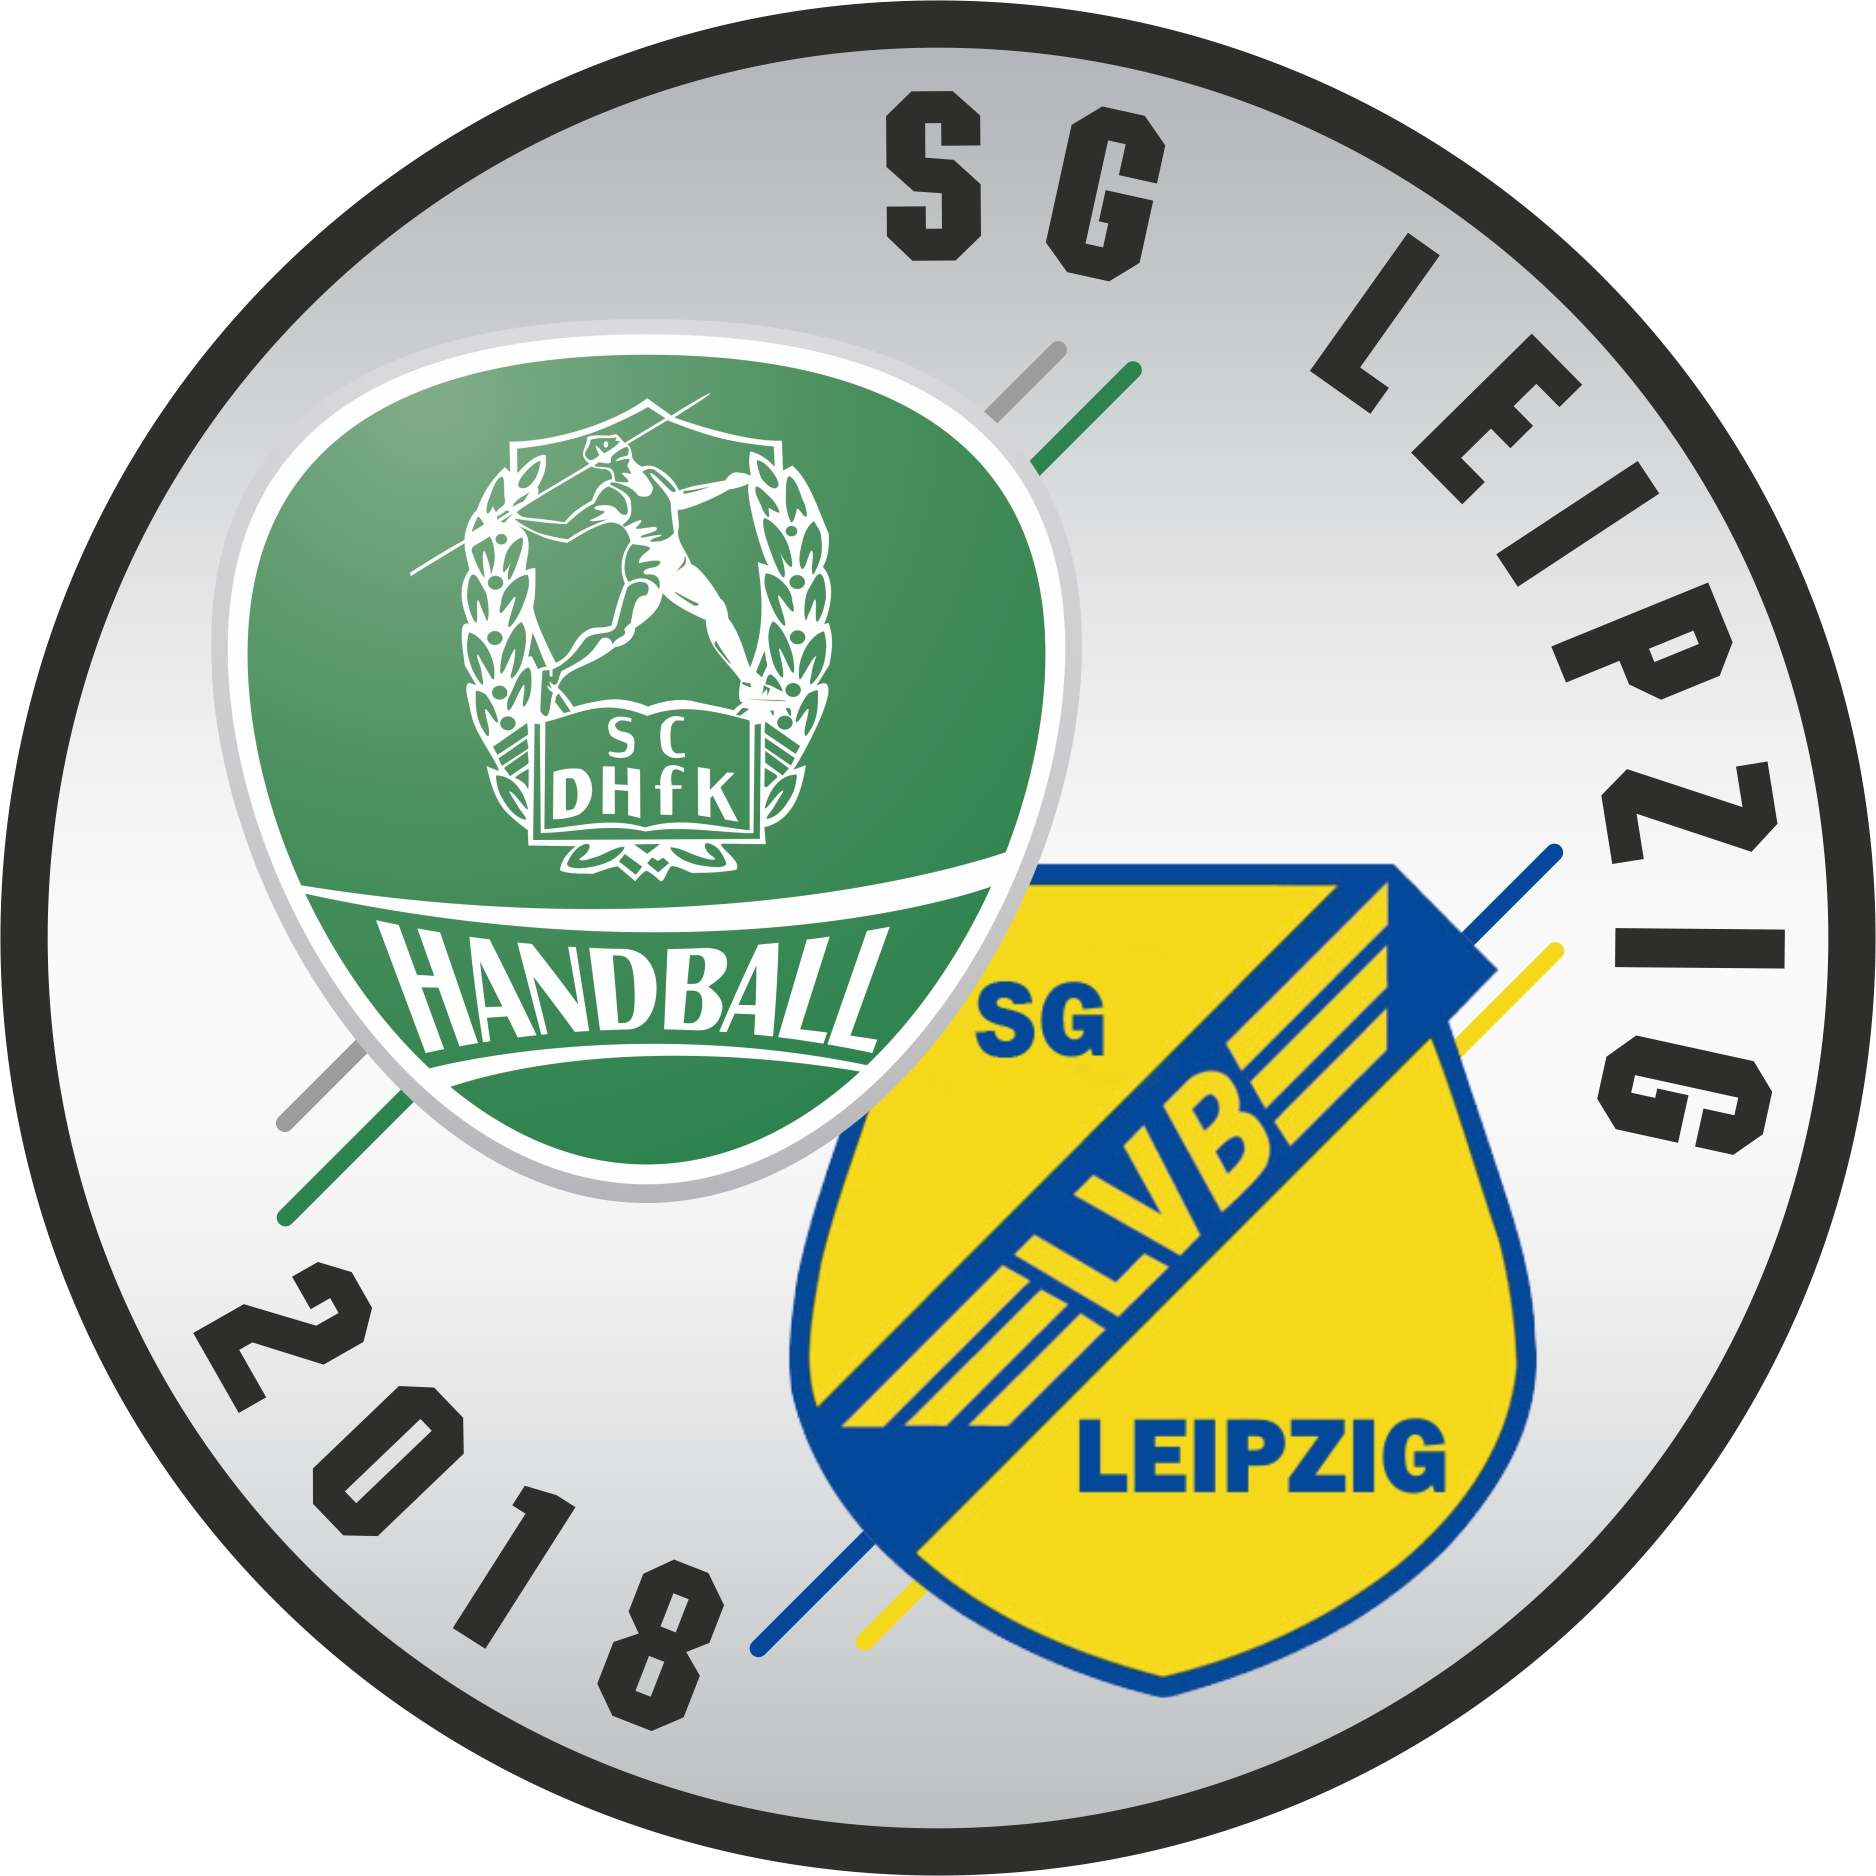 SG Leipzig II 2018 - 3. Handball-Liga Ost